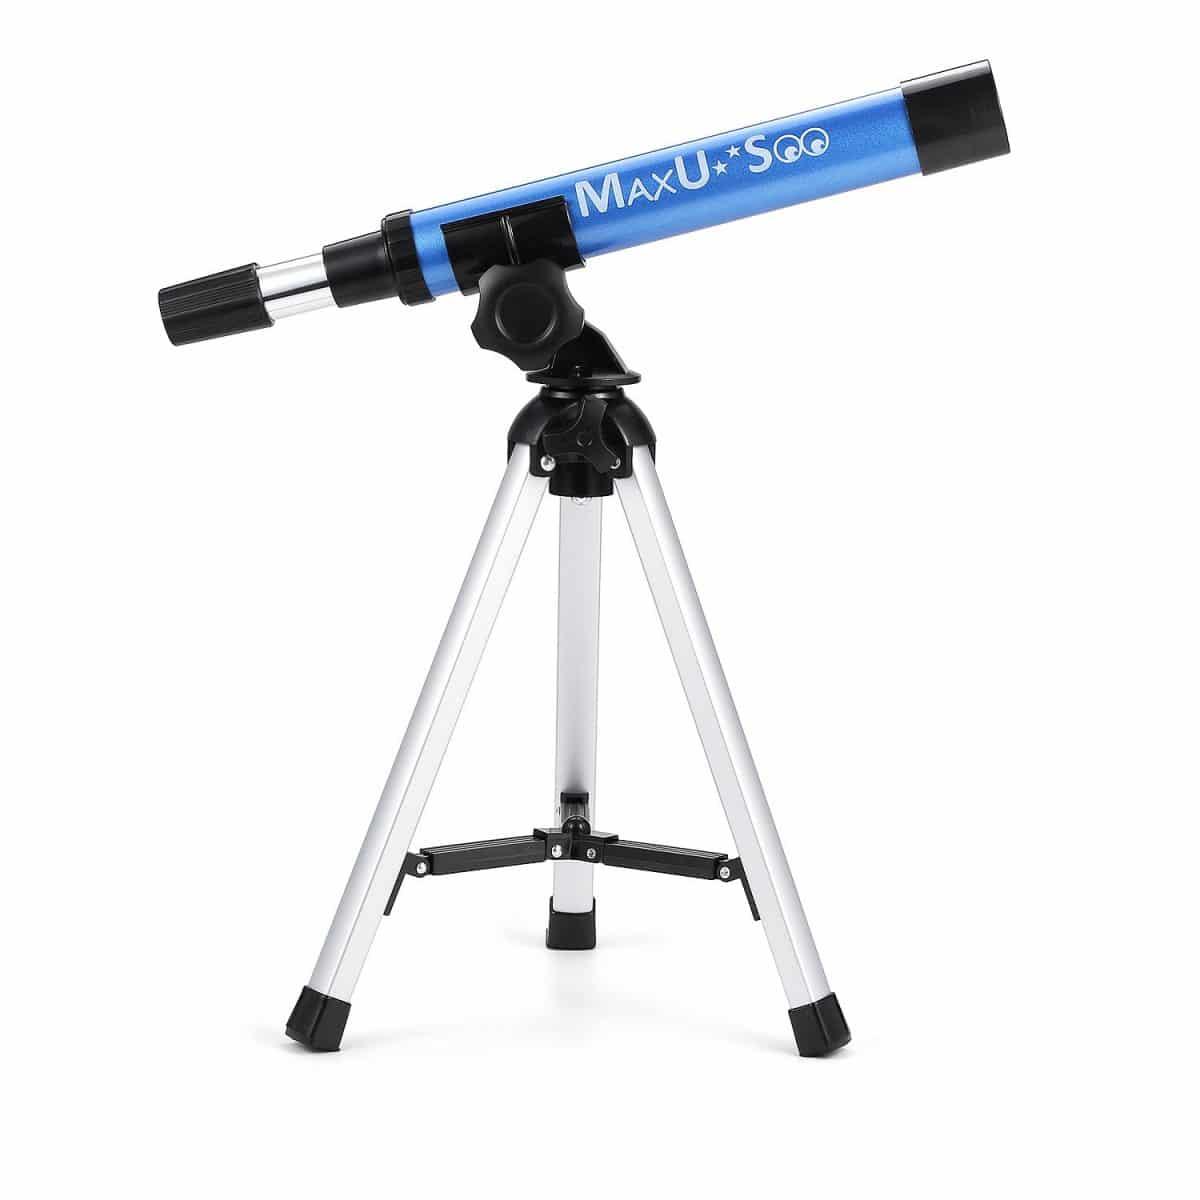 8 Pack Kids Black Plastic 10 Toy Pirate Telescopes